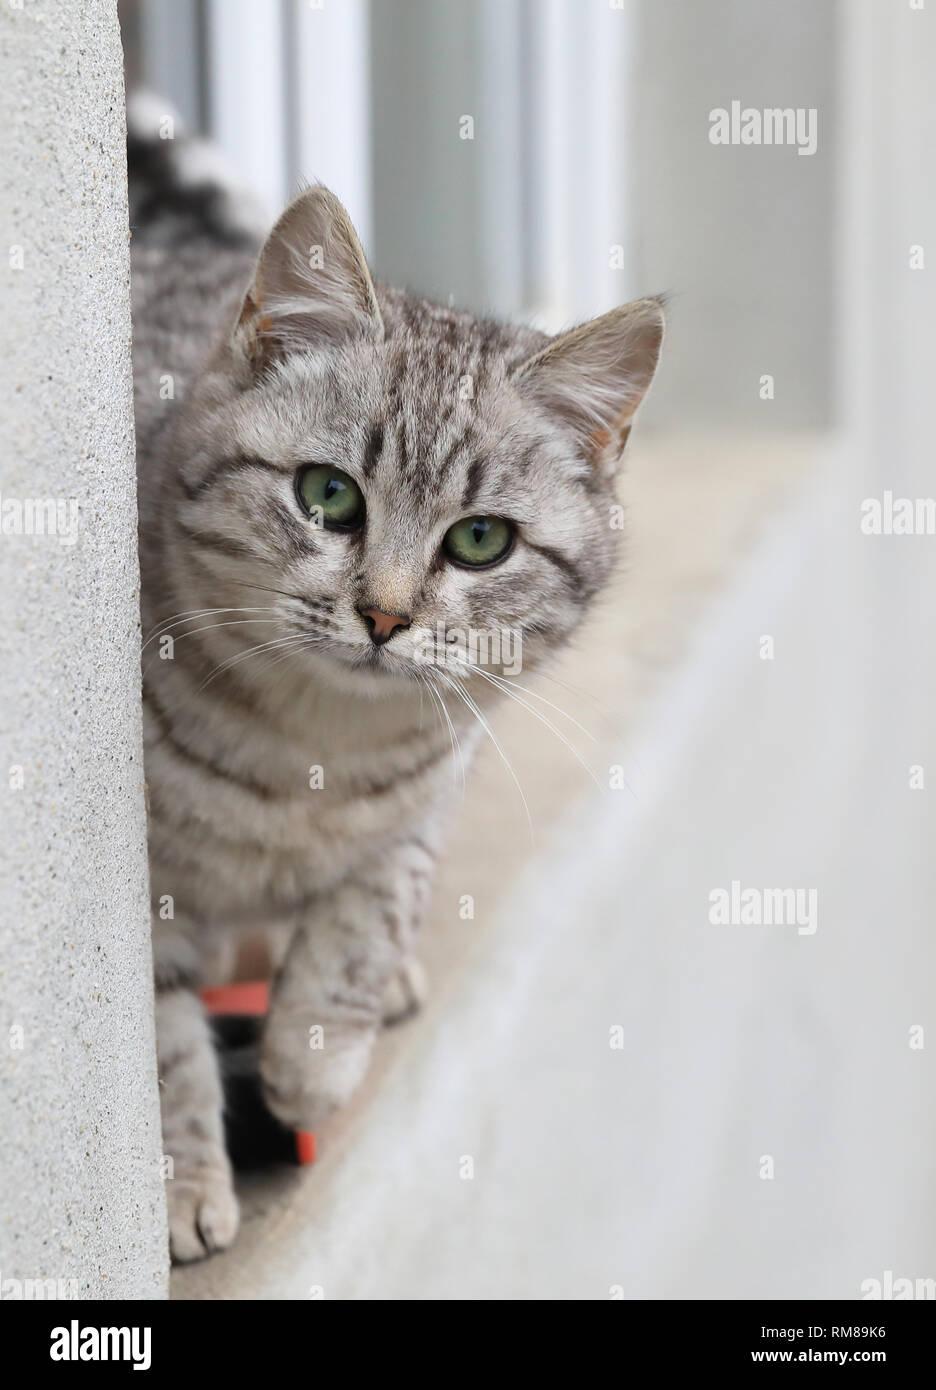 Cute kitten on the window ledge in the winter - Stock Image